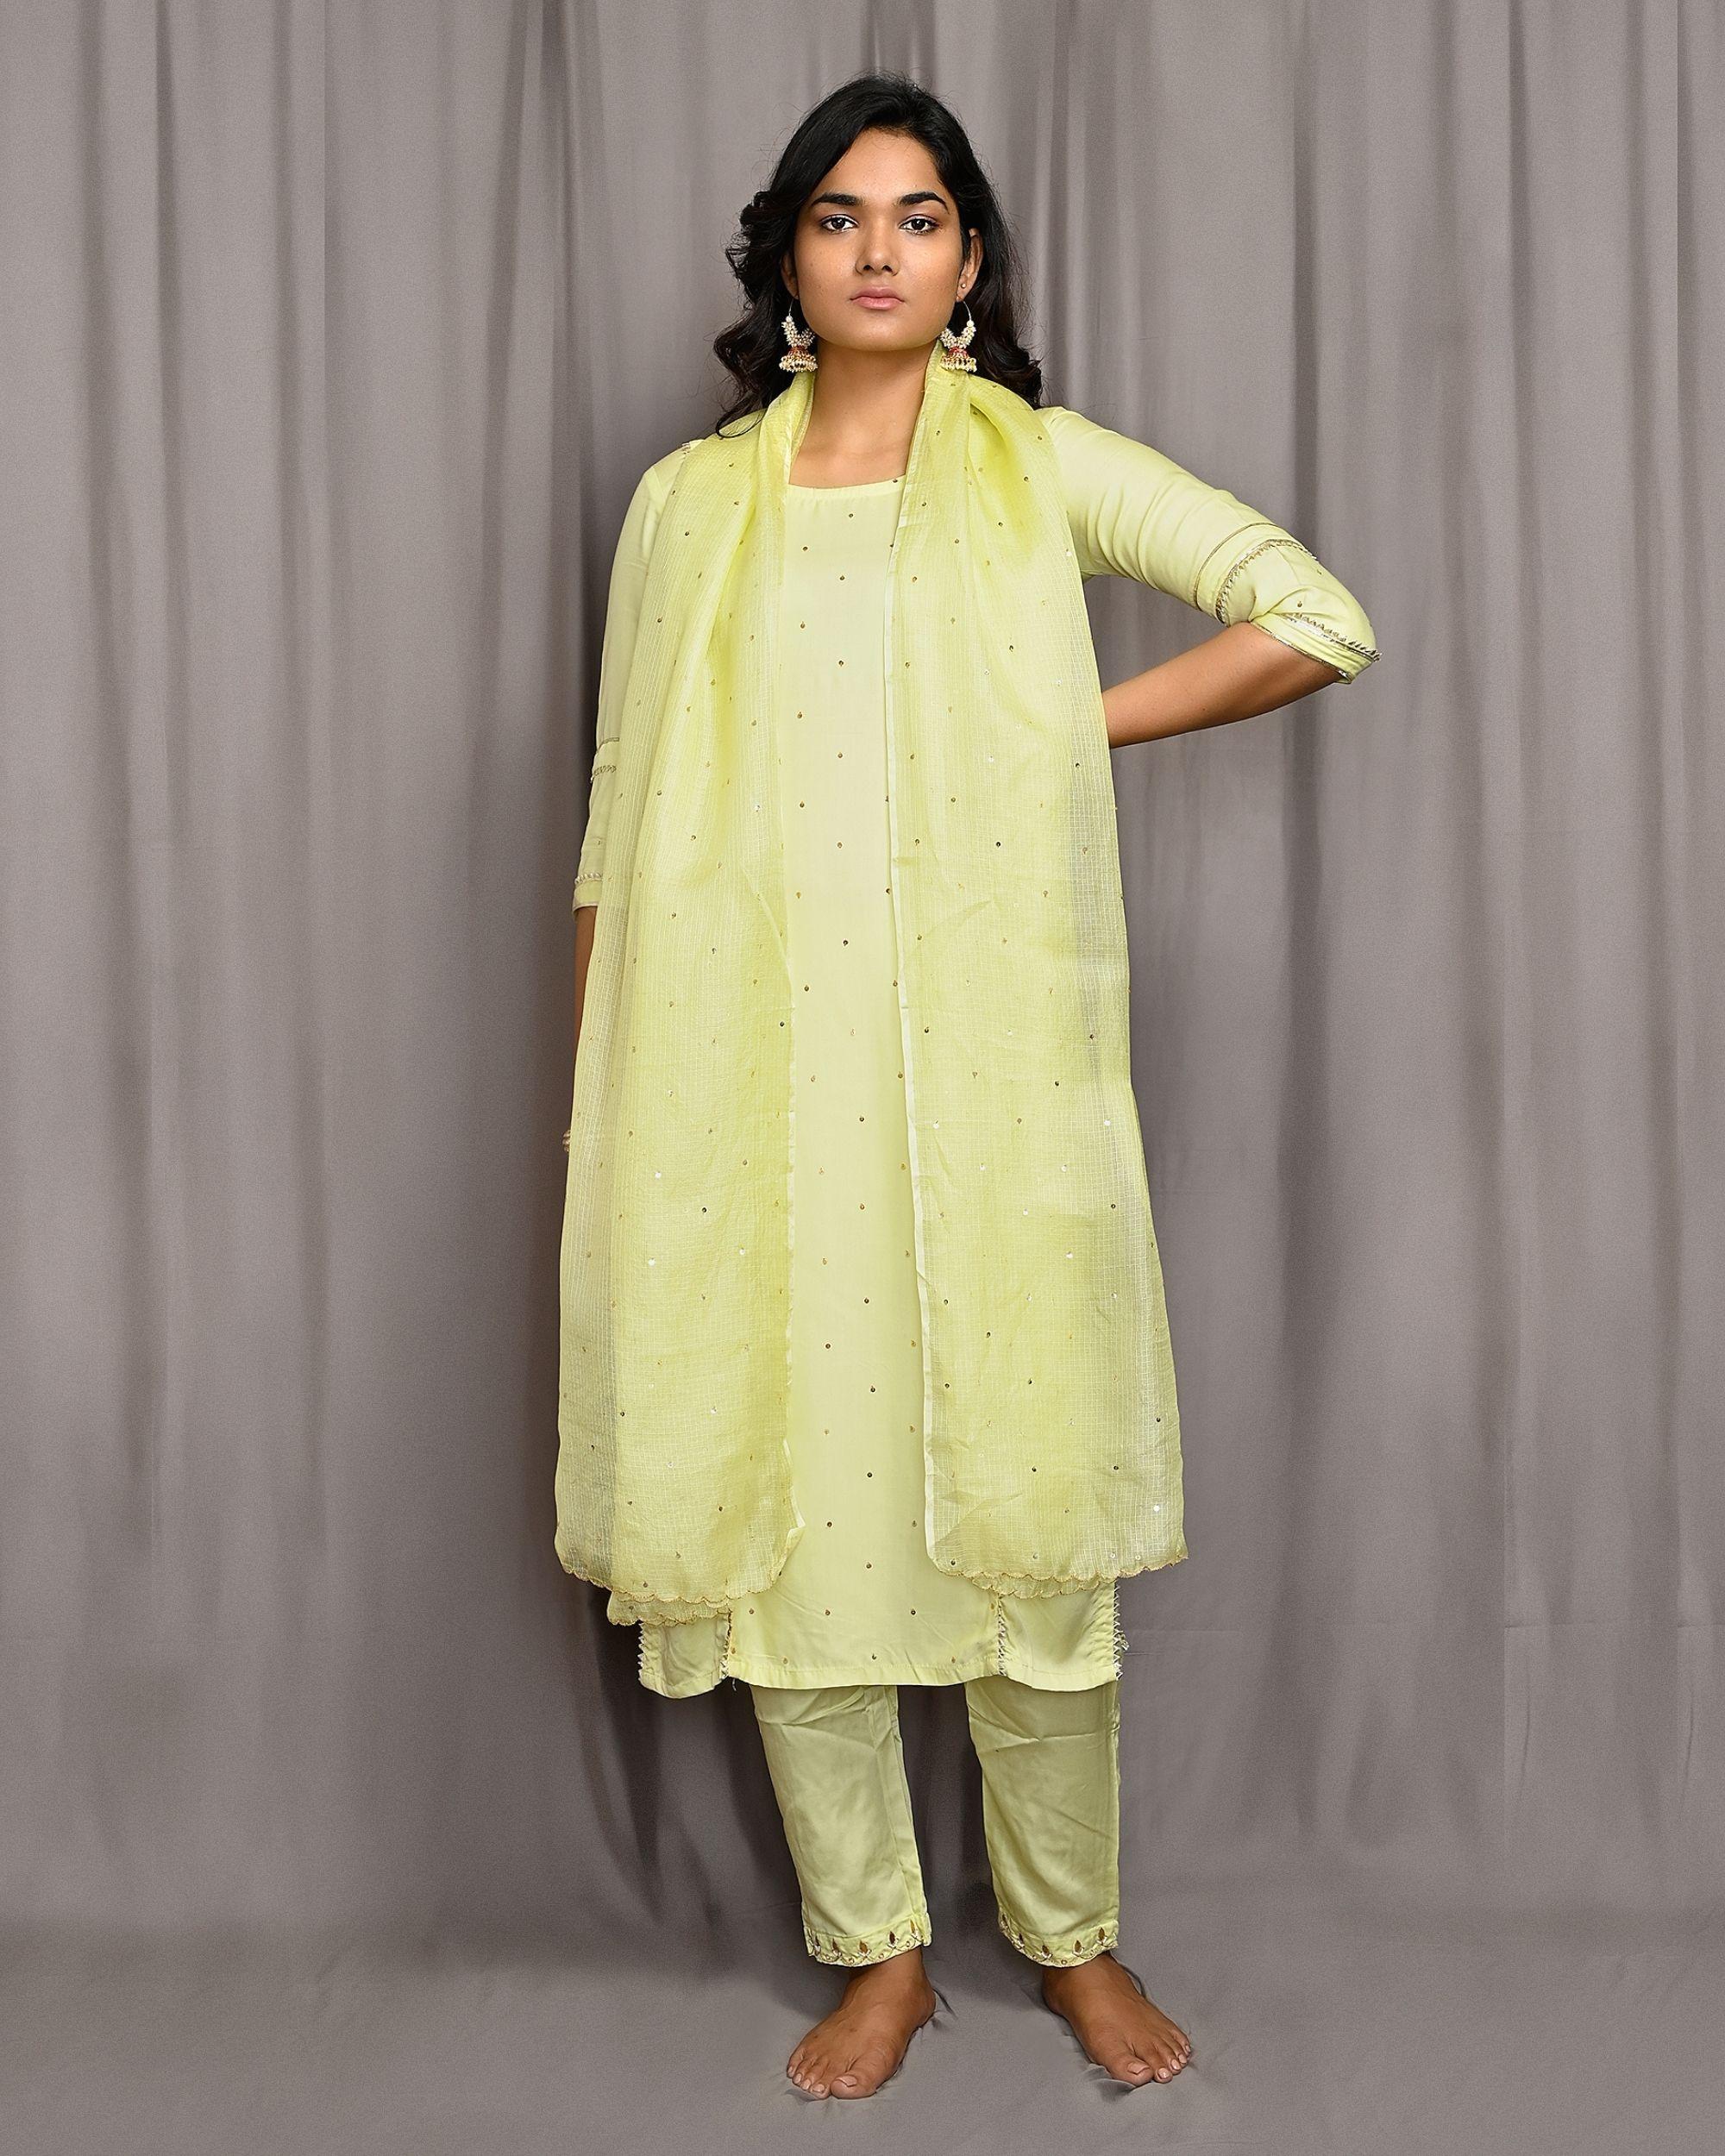 Lemon yellow embroidered gota kurta with pants and dupatta - Set Of Three